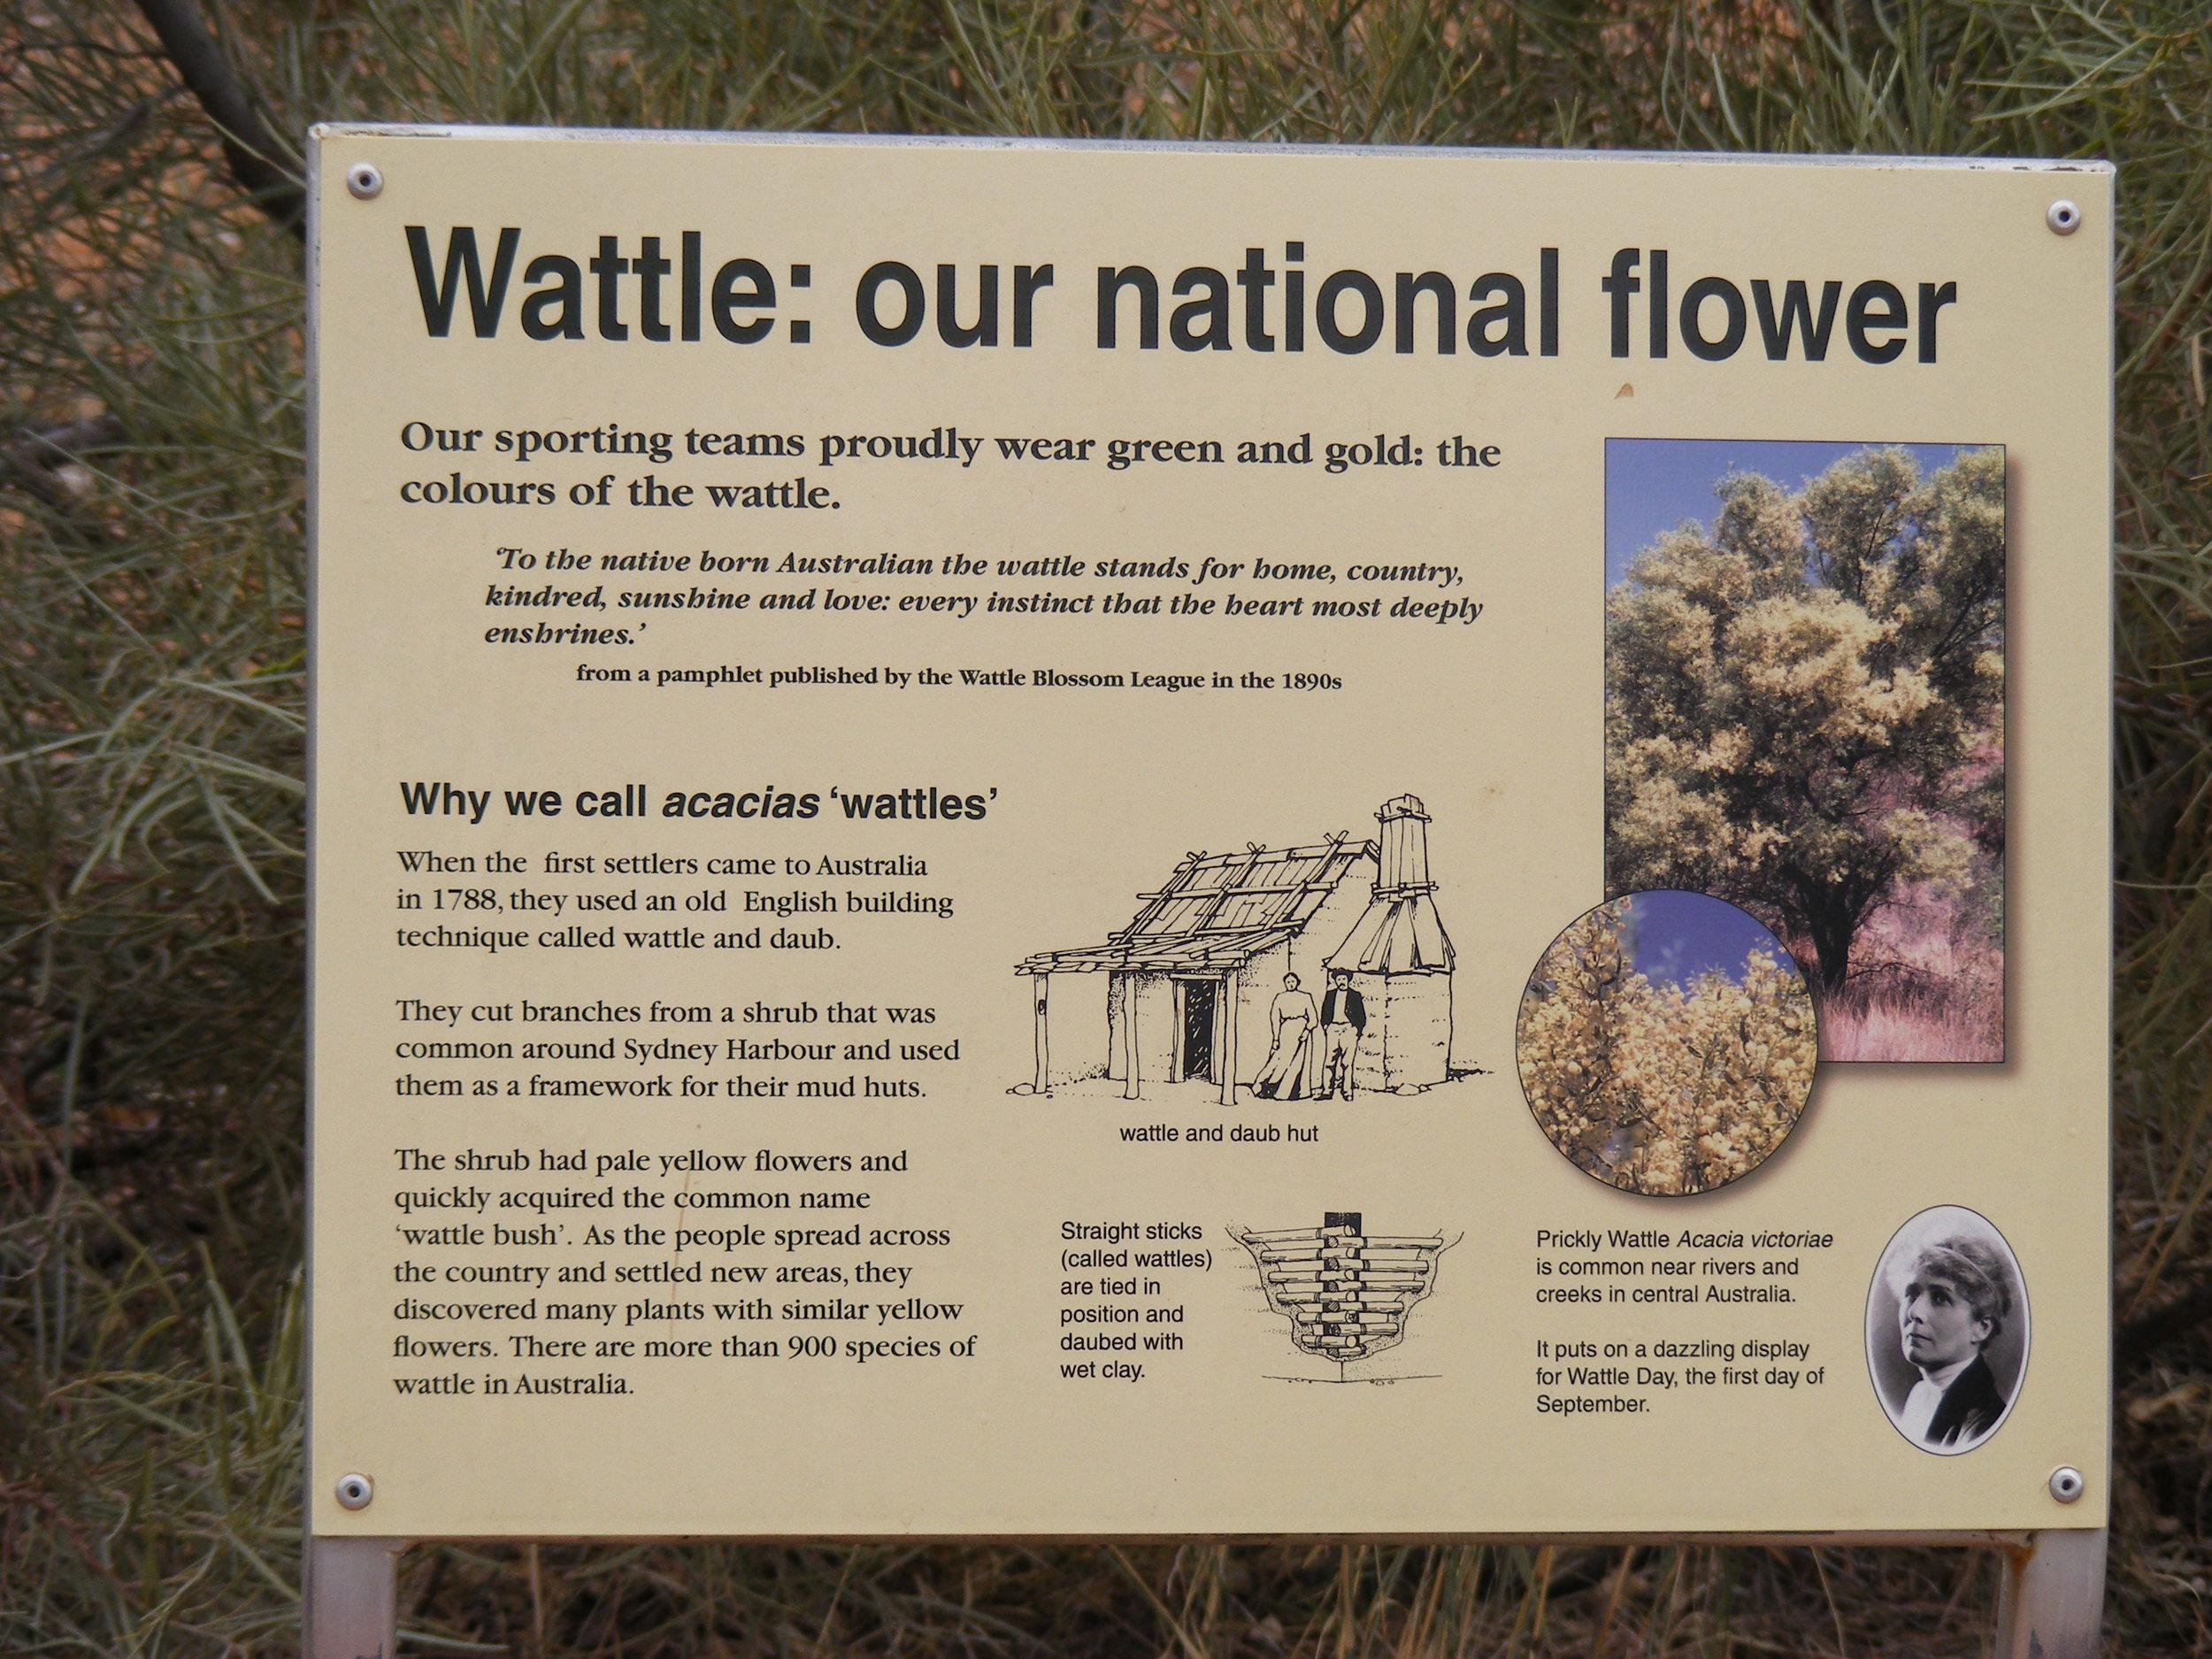 Wattle, the national flower